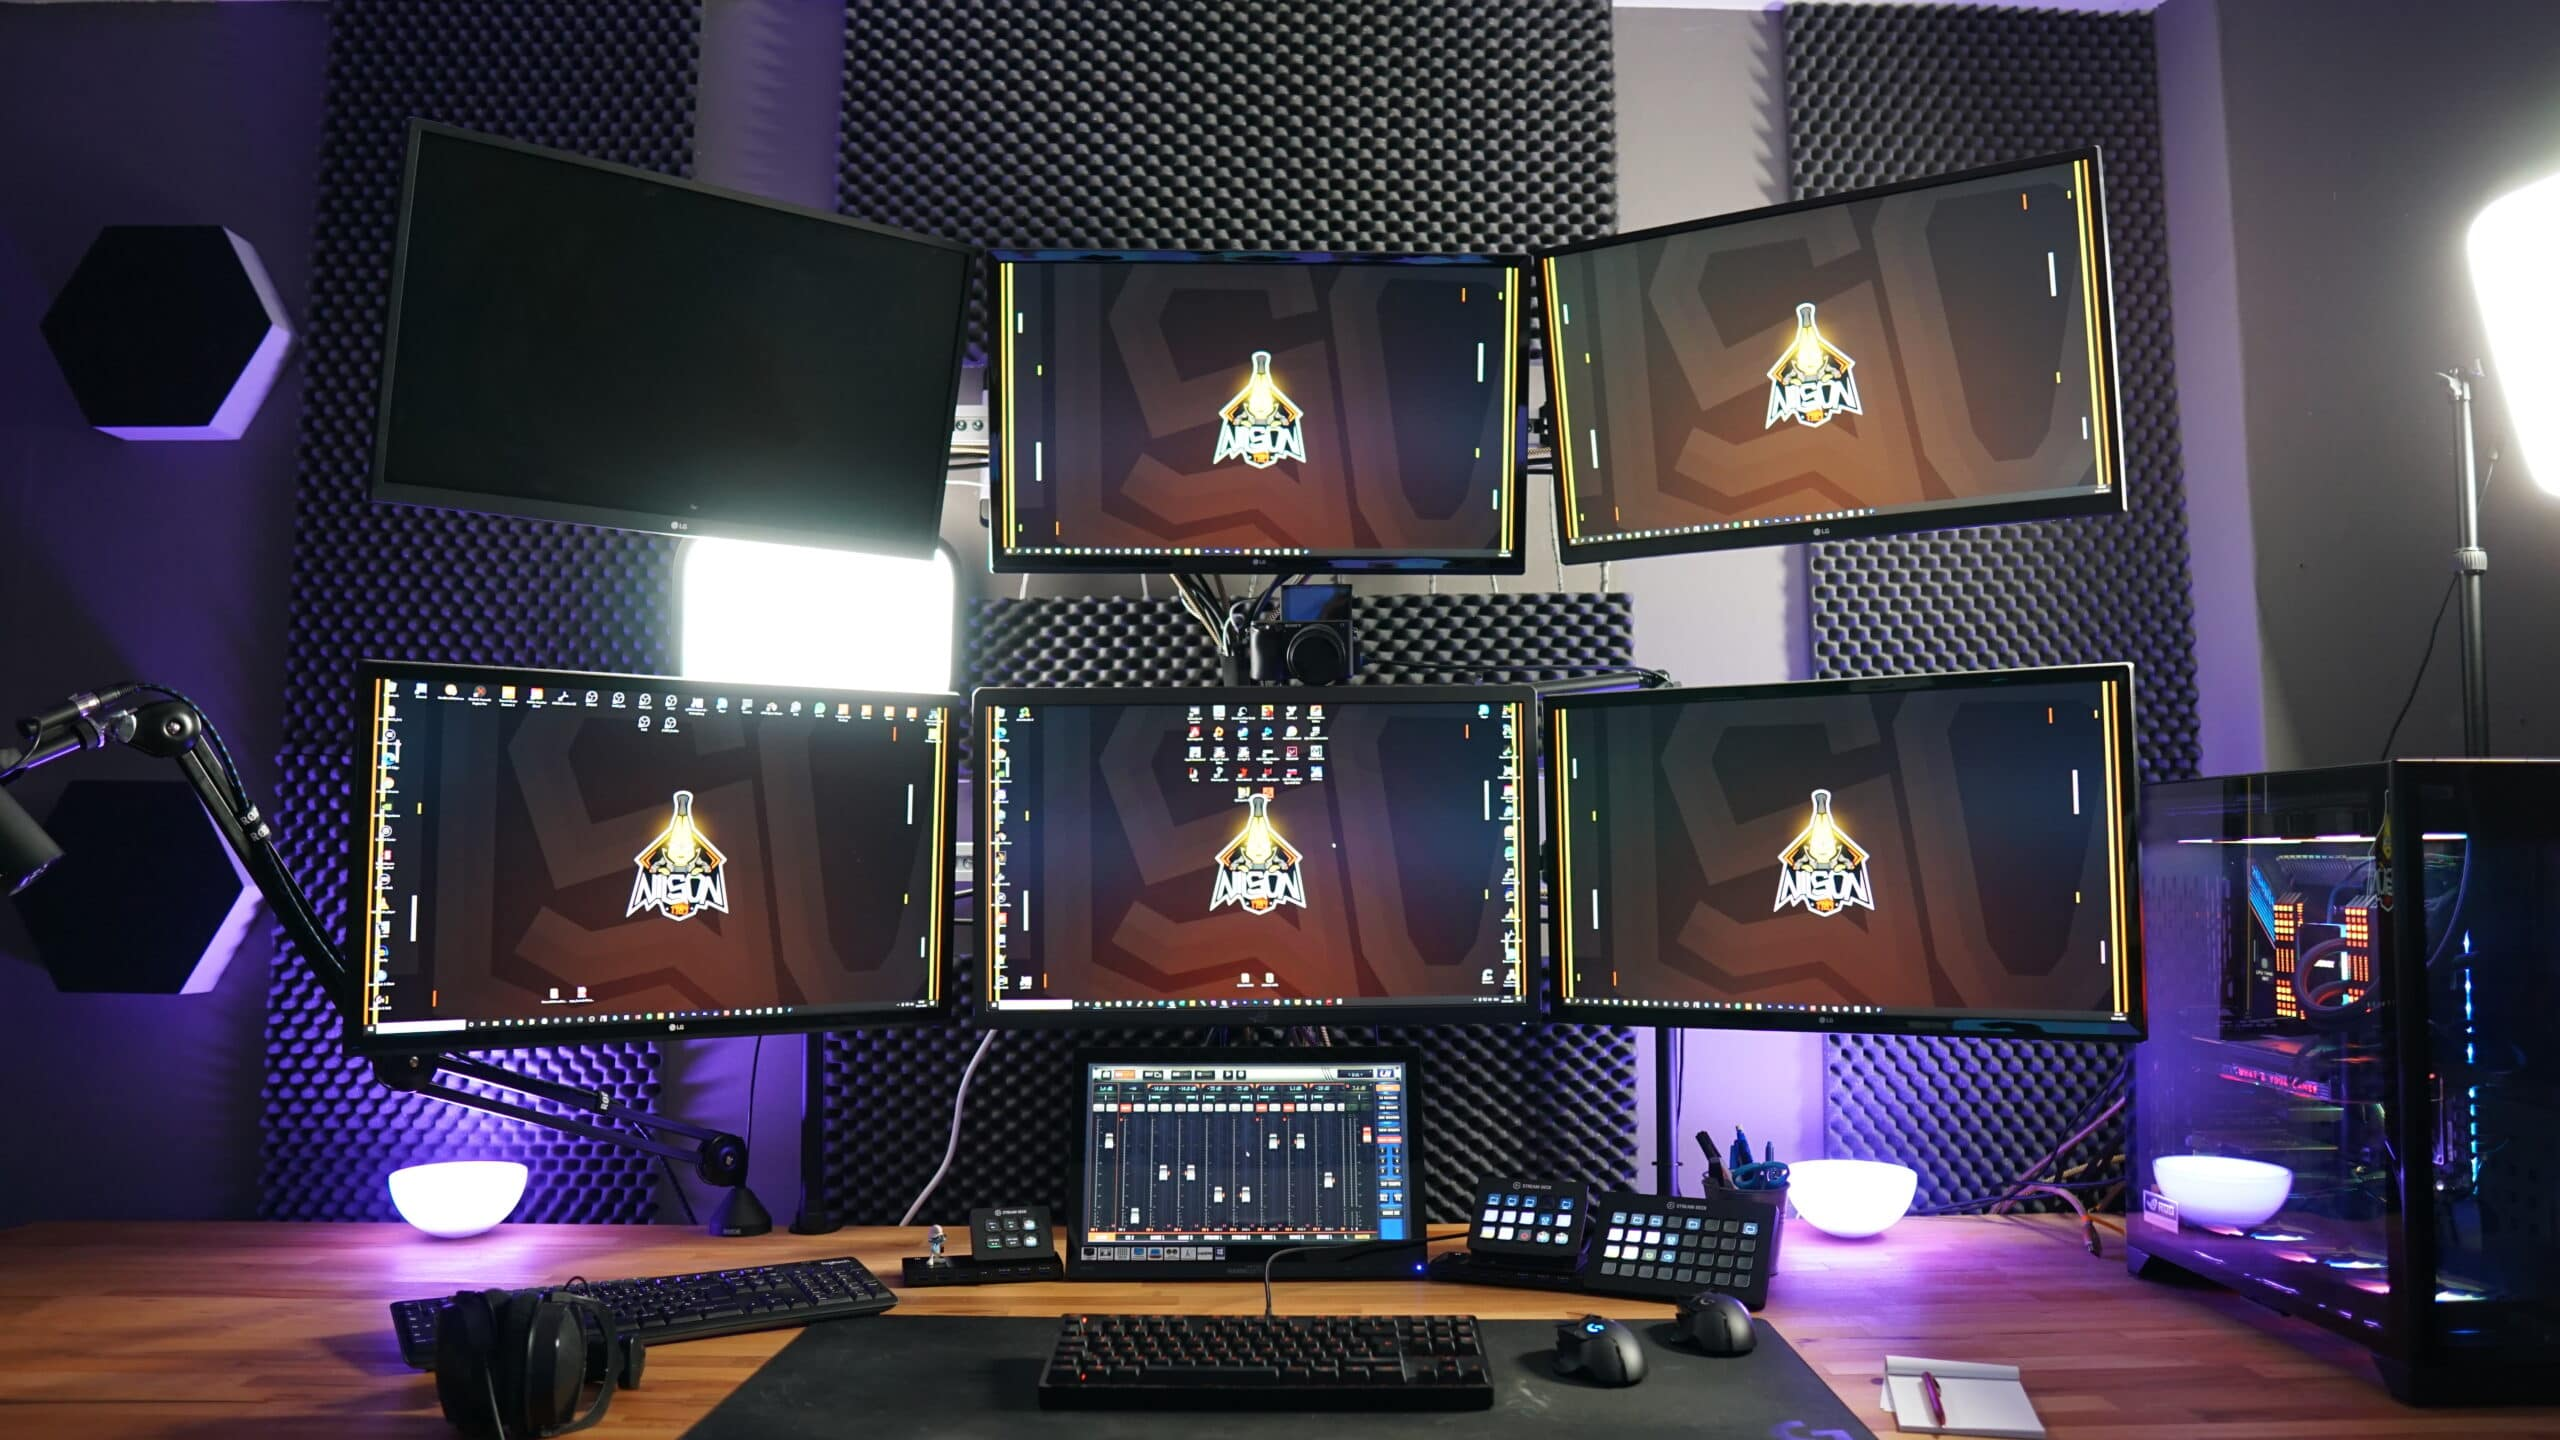 Streamen auf Twitch (PC)